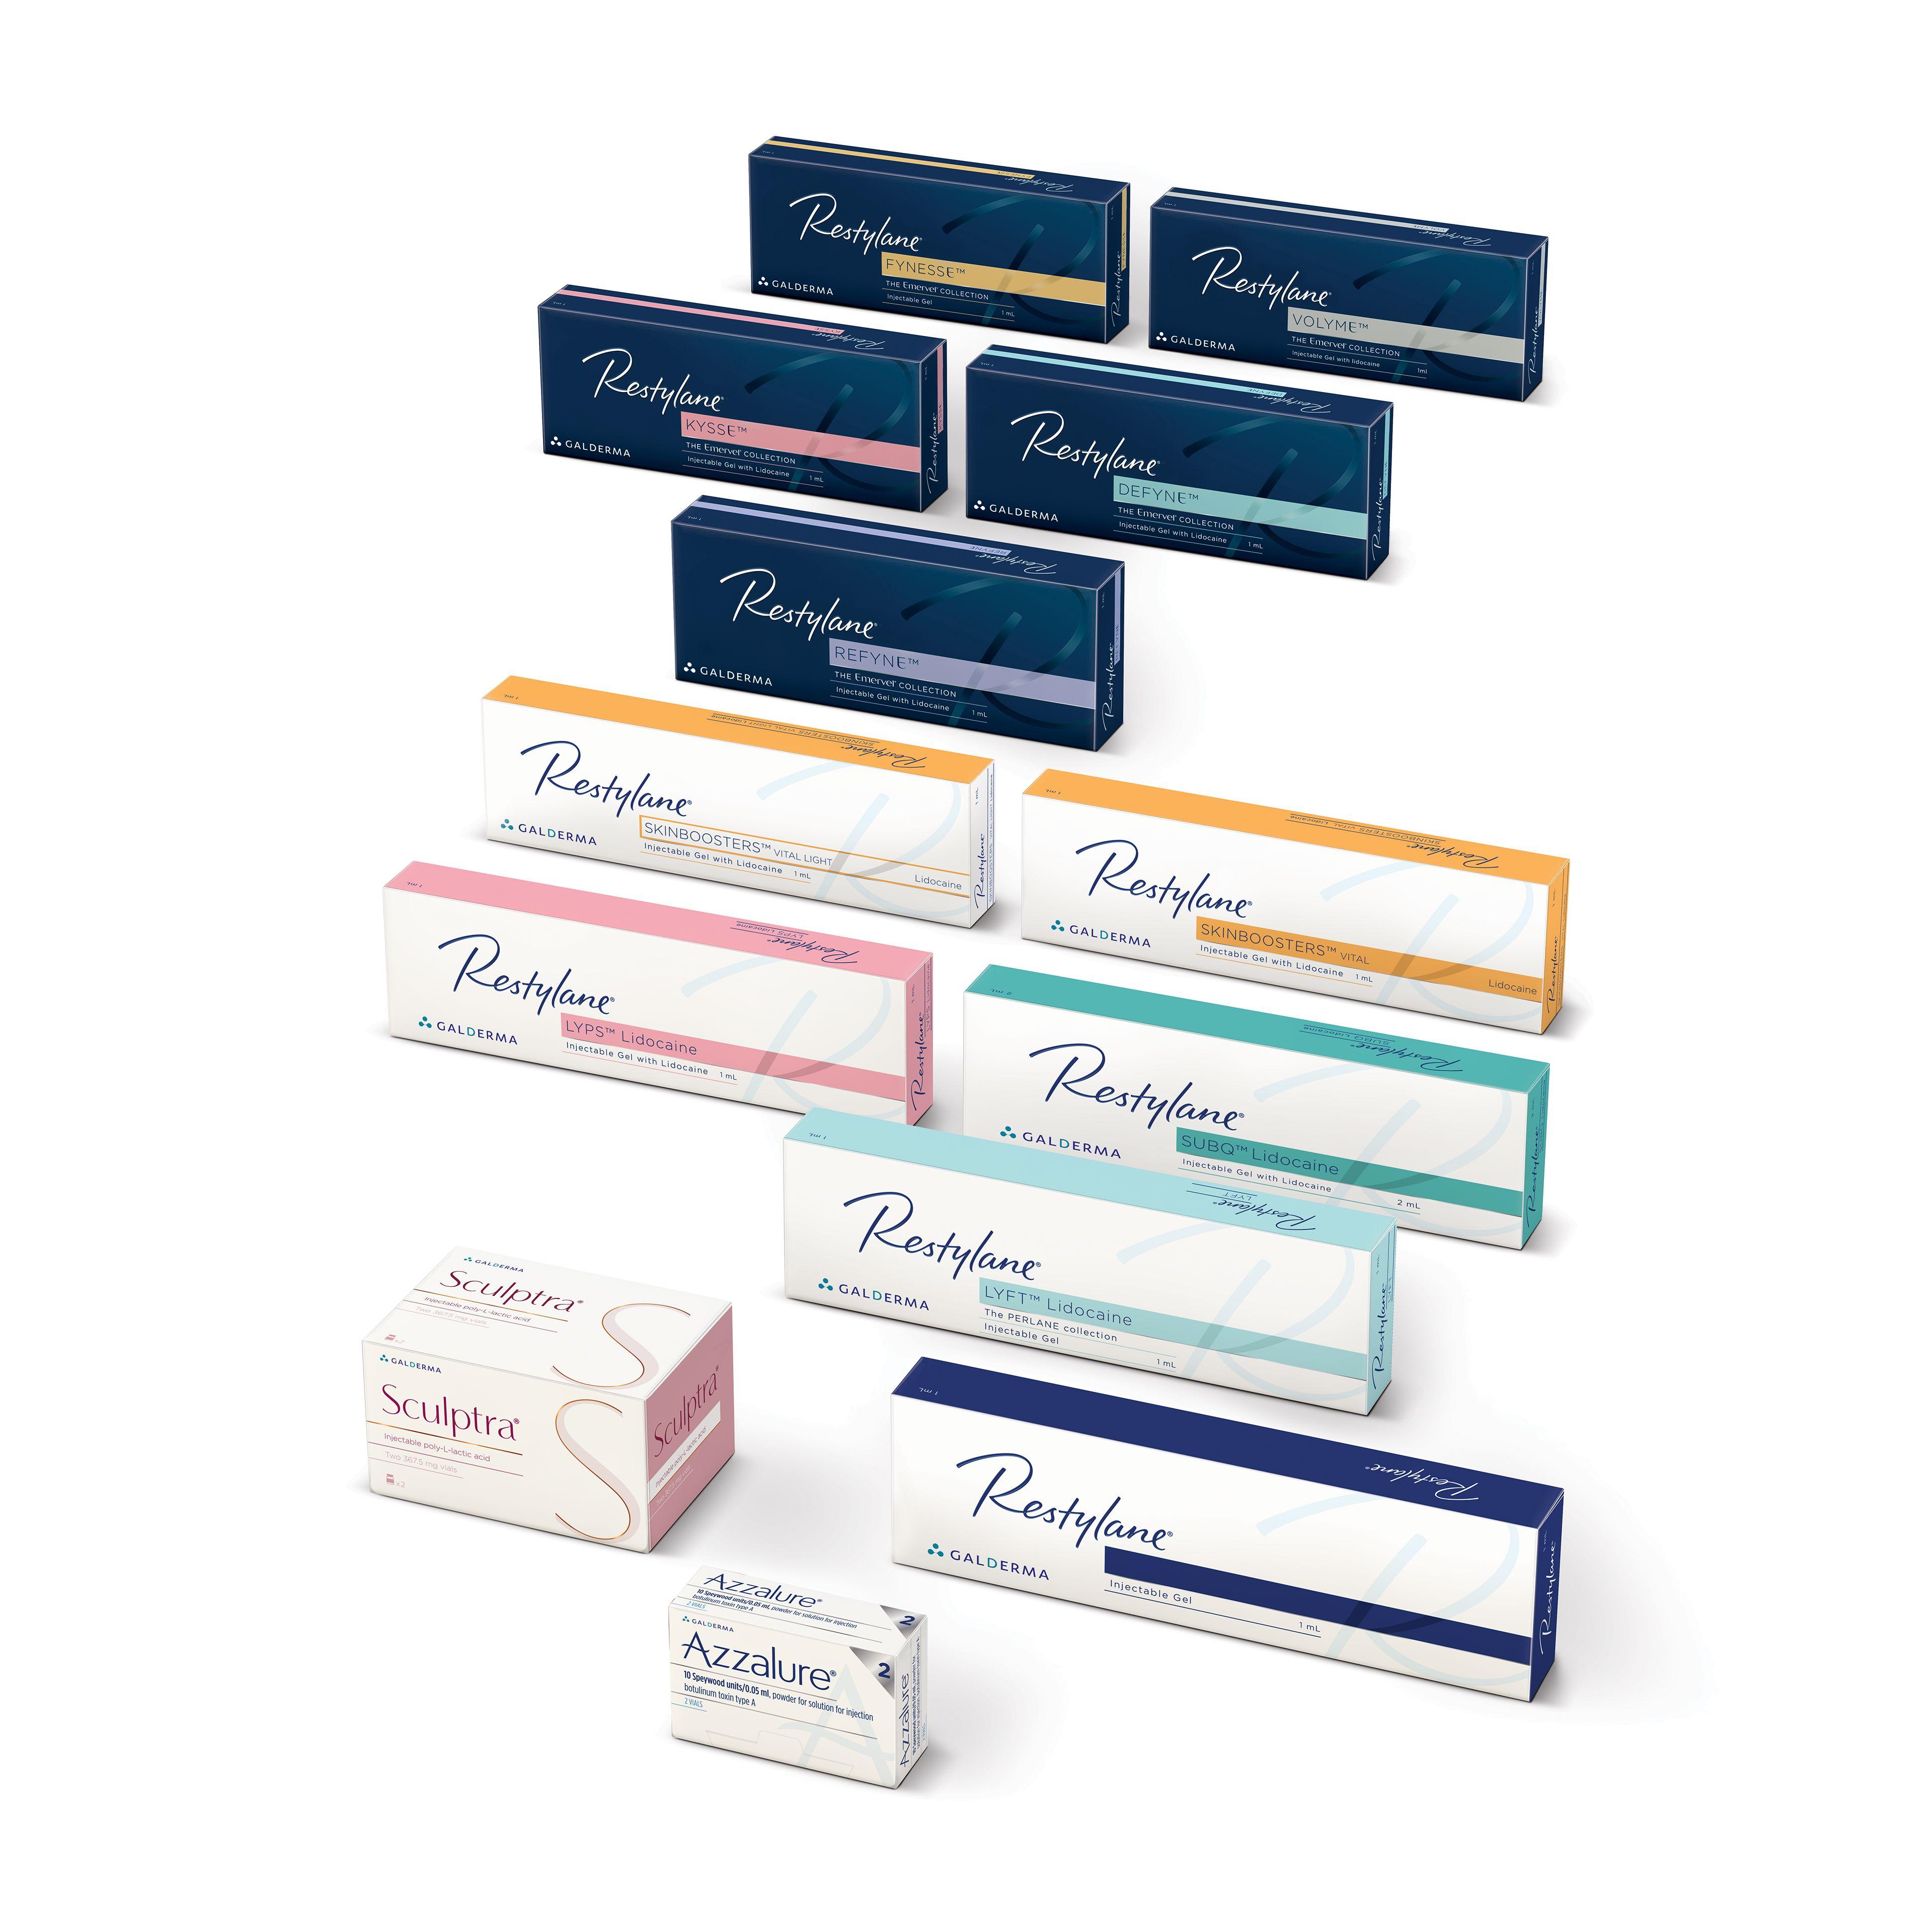 Portfolio Restylane Anti Aging For All Skin Types Restylane